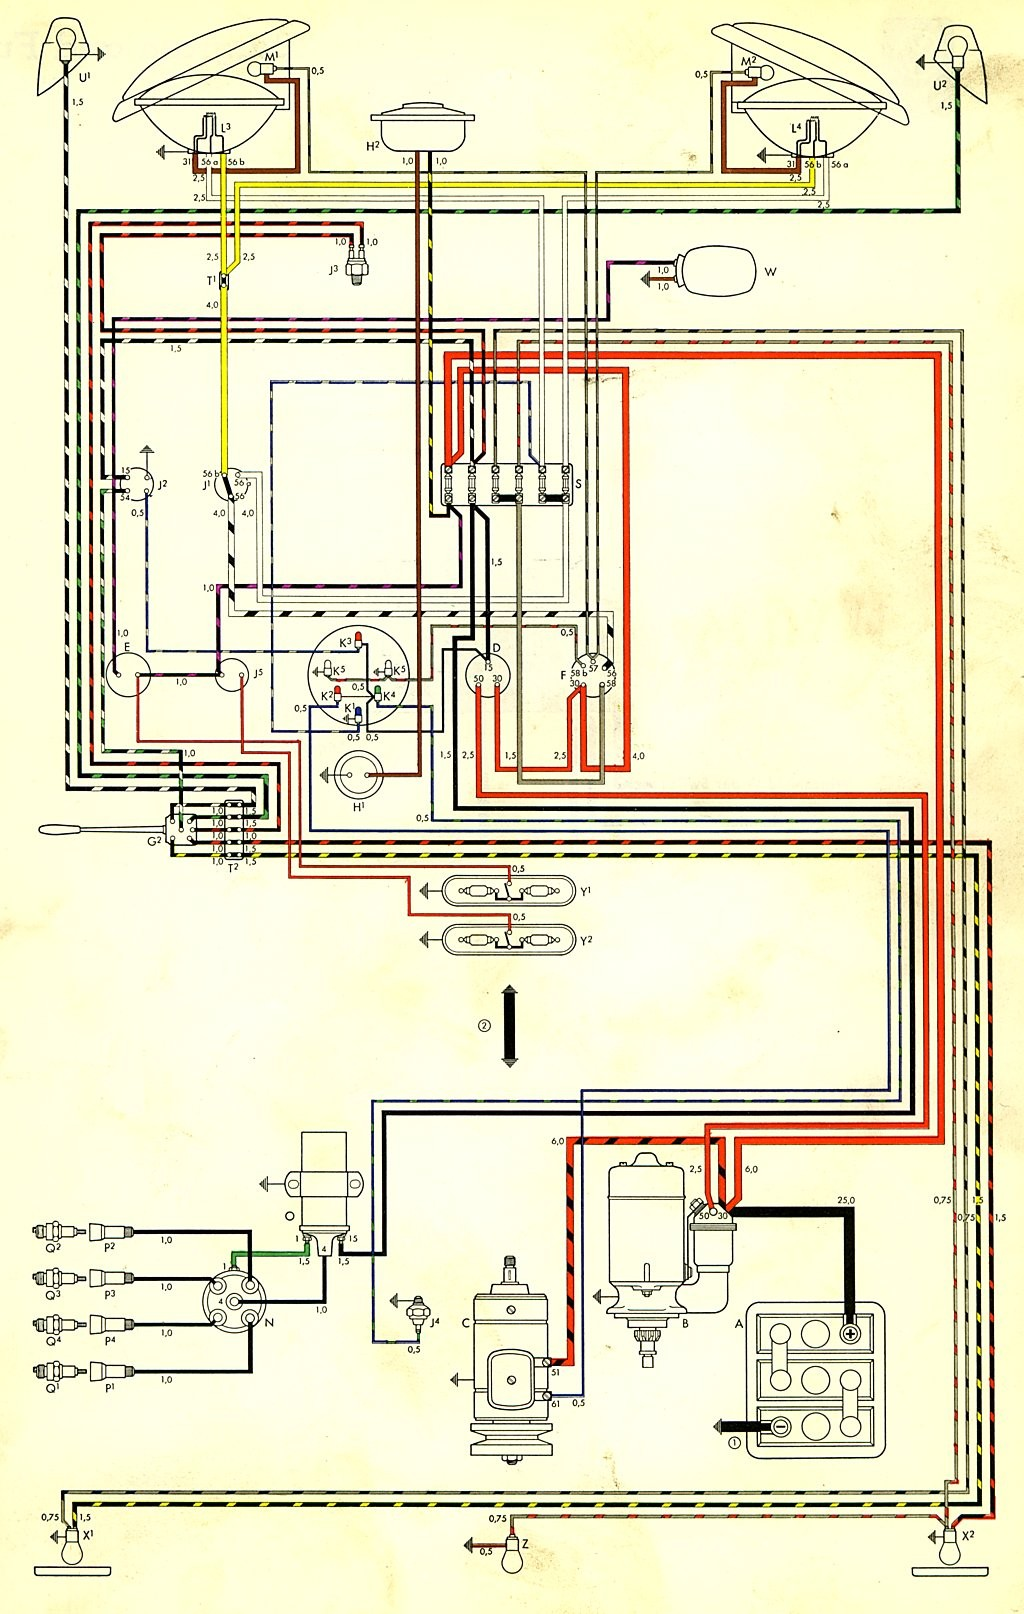 1971 Vw Bus Wiring Diagram | Wiring Diagram Liries  Vw Sdometer Wiring Diagram on 1974 vw fuel pump, 1974 vw wheels, 1974 vw exhaust, 1974 vw motor, 1974 vw alternator, 1974 vw oil pump, 1974 vw carburetor, 1974 vw fuel system diagram, 1974 vw automatic transmission, 1974 vw oil cooler, vw beetle diagram, 1974 vw firing order, 1974 vw seats, 1974 vw heater, 1974 vw oil filter, 1974 vw charging system diagram, 1974 vw accessories, 1974 vw parts, 1974 vw suspension, 1974 vw engine,